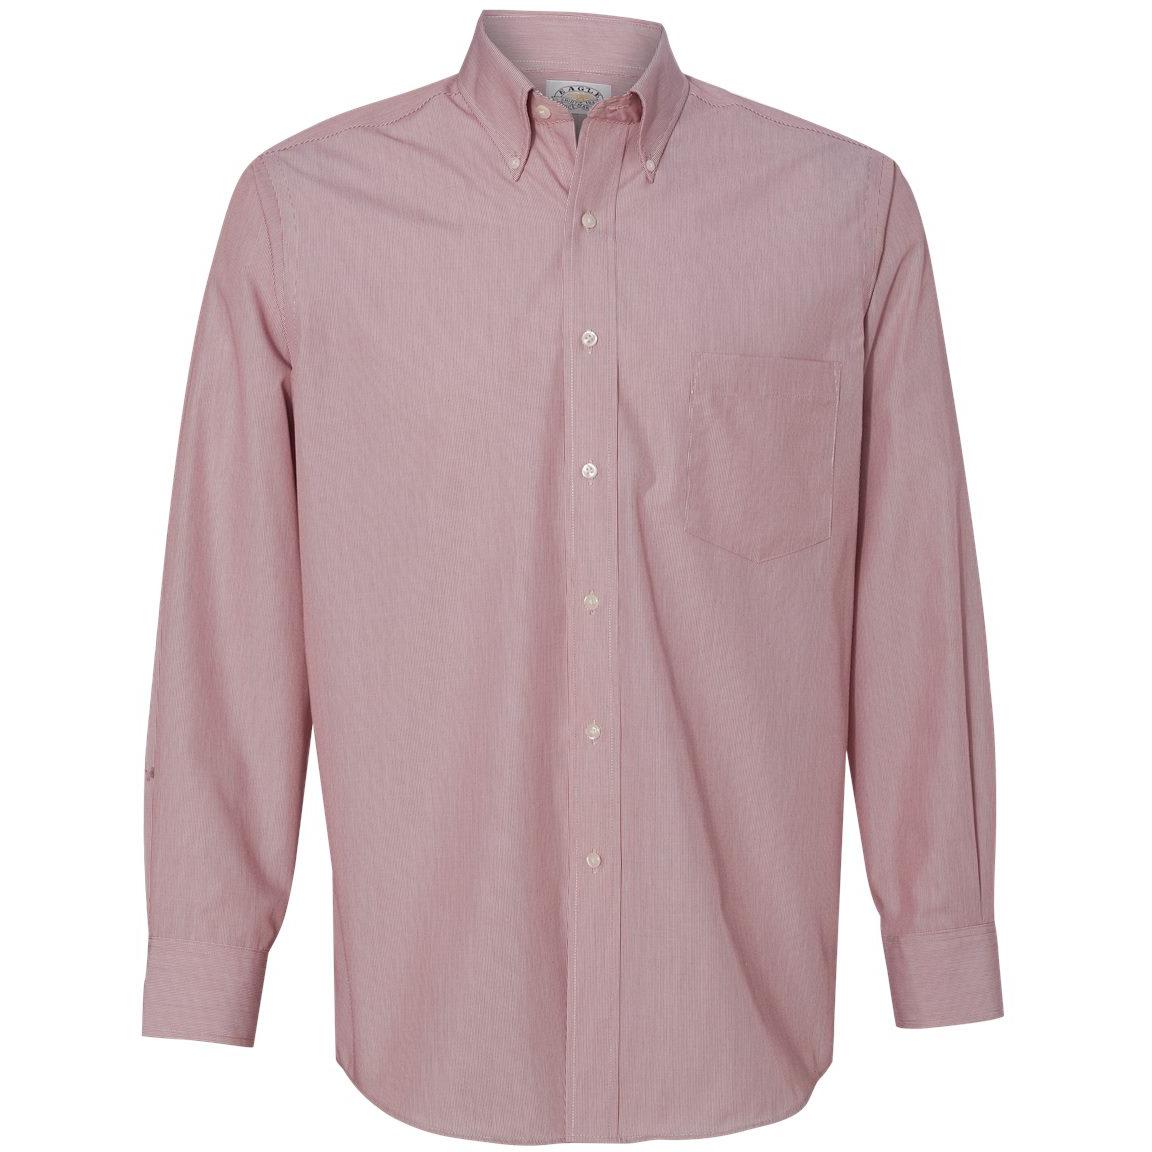 Van heusen 13v0420 non iron featherstripe shirt red for Van heusen iron free shirts